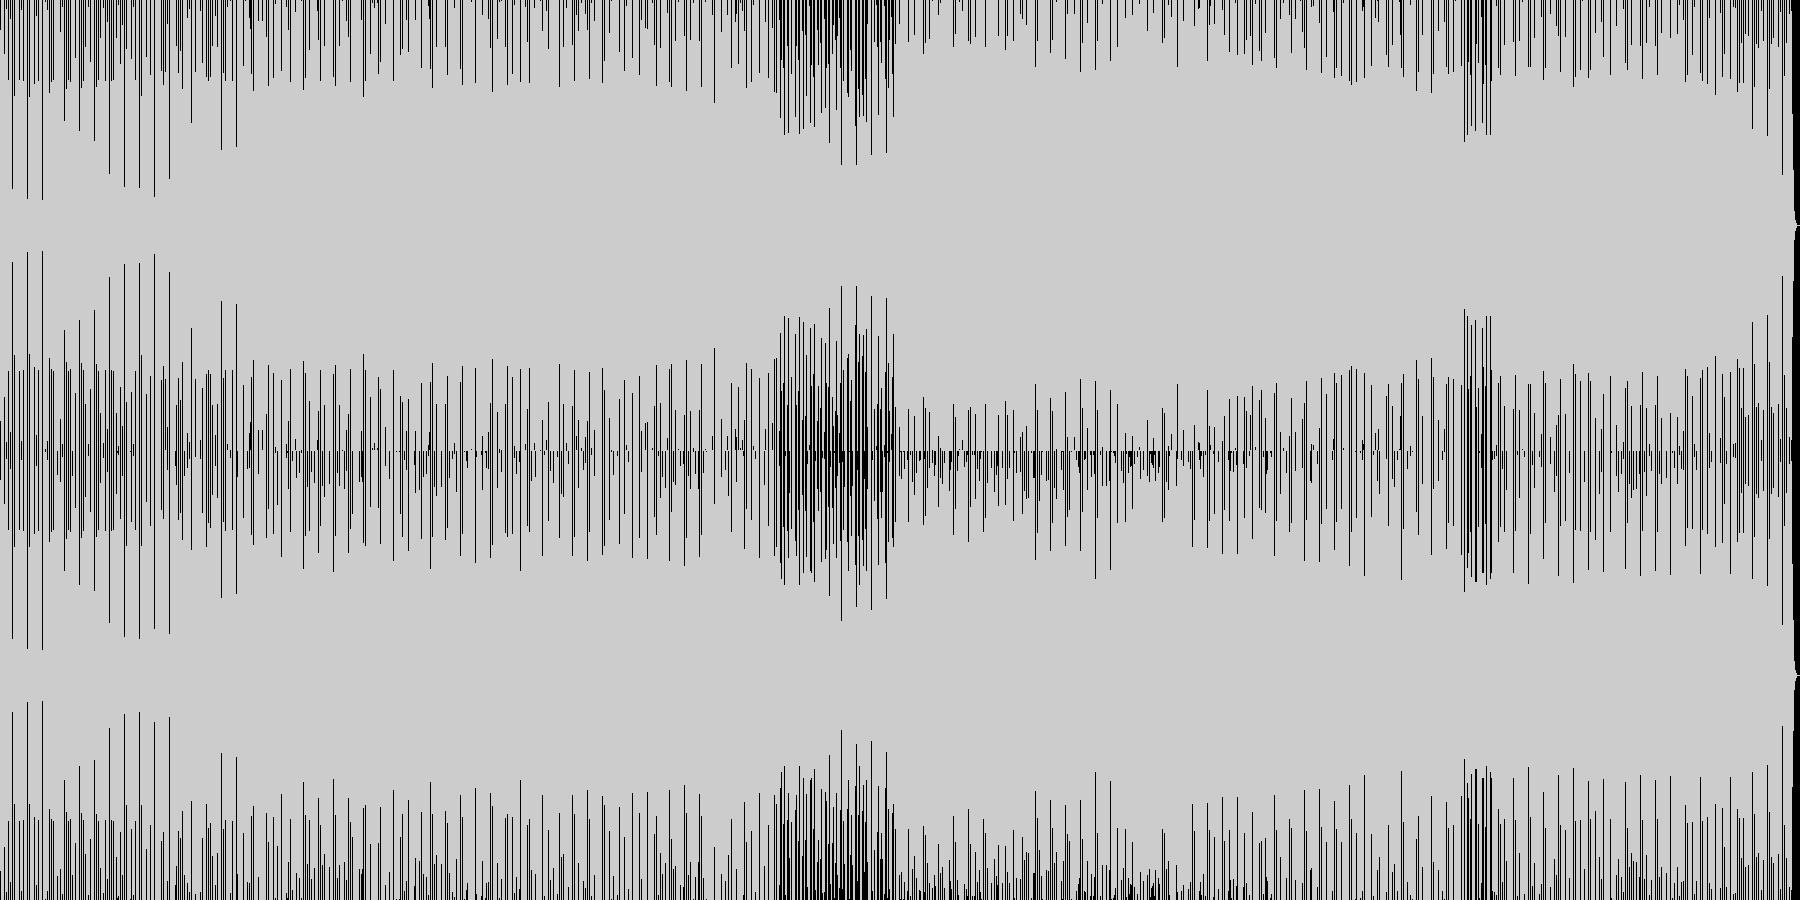 minimal house 23の未再生の波形